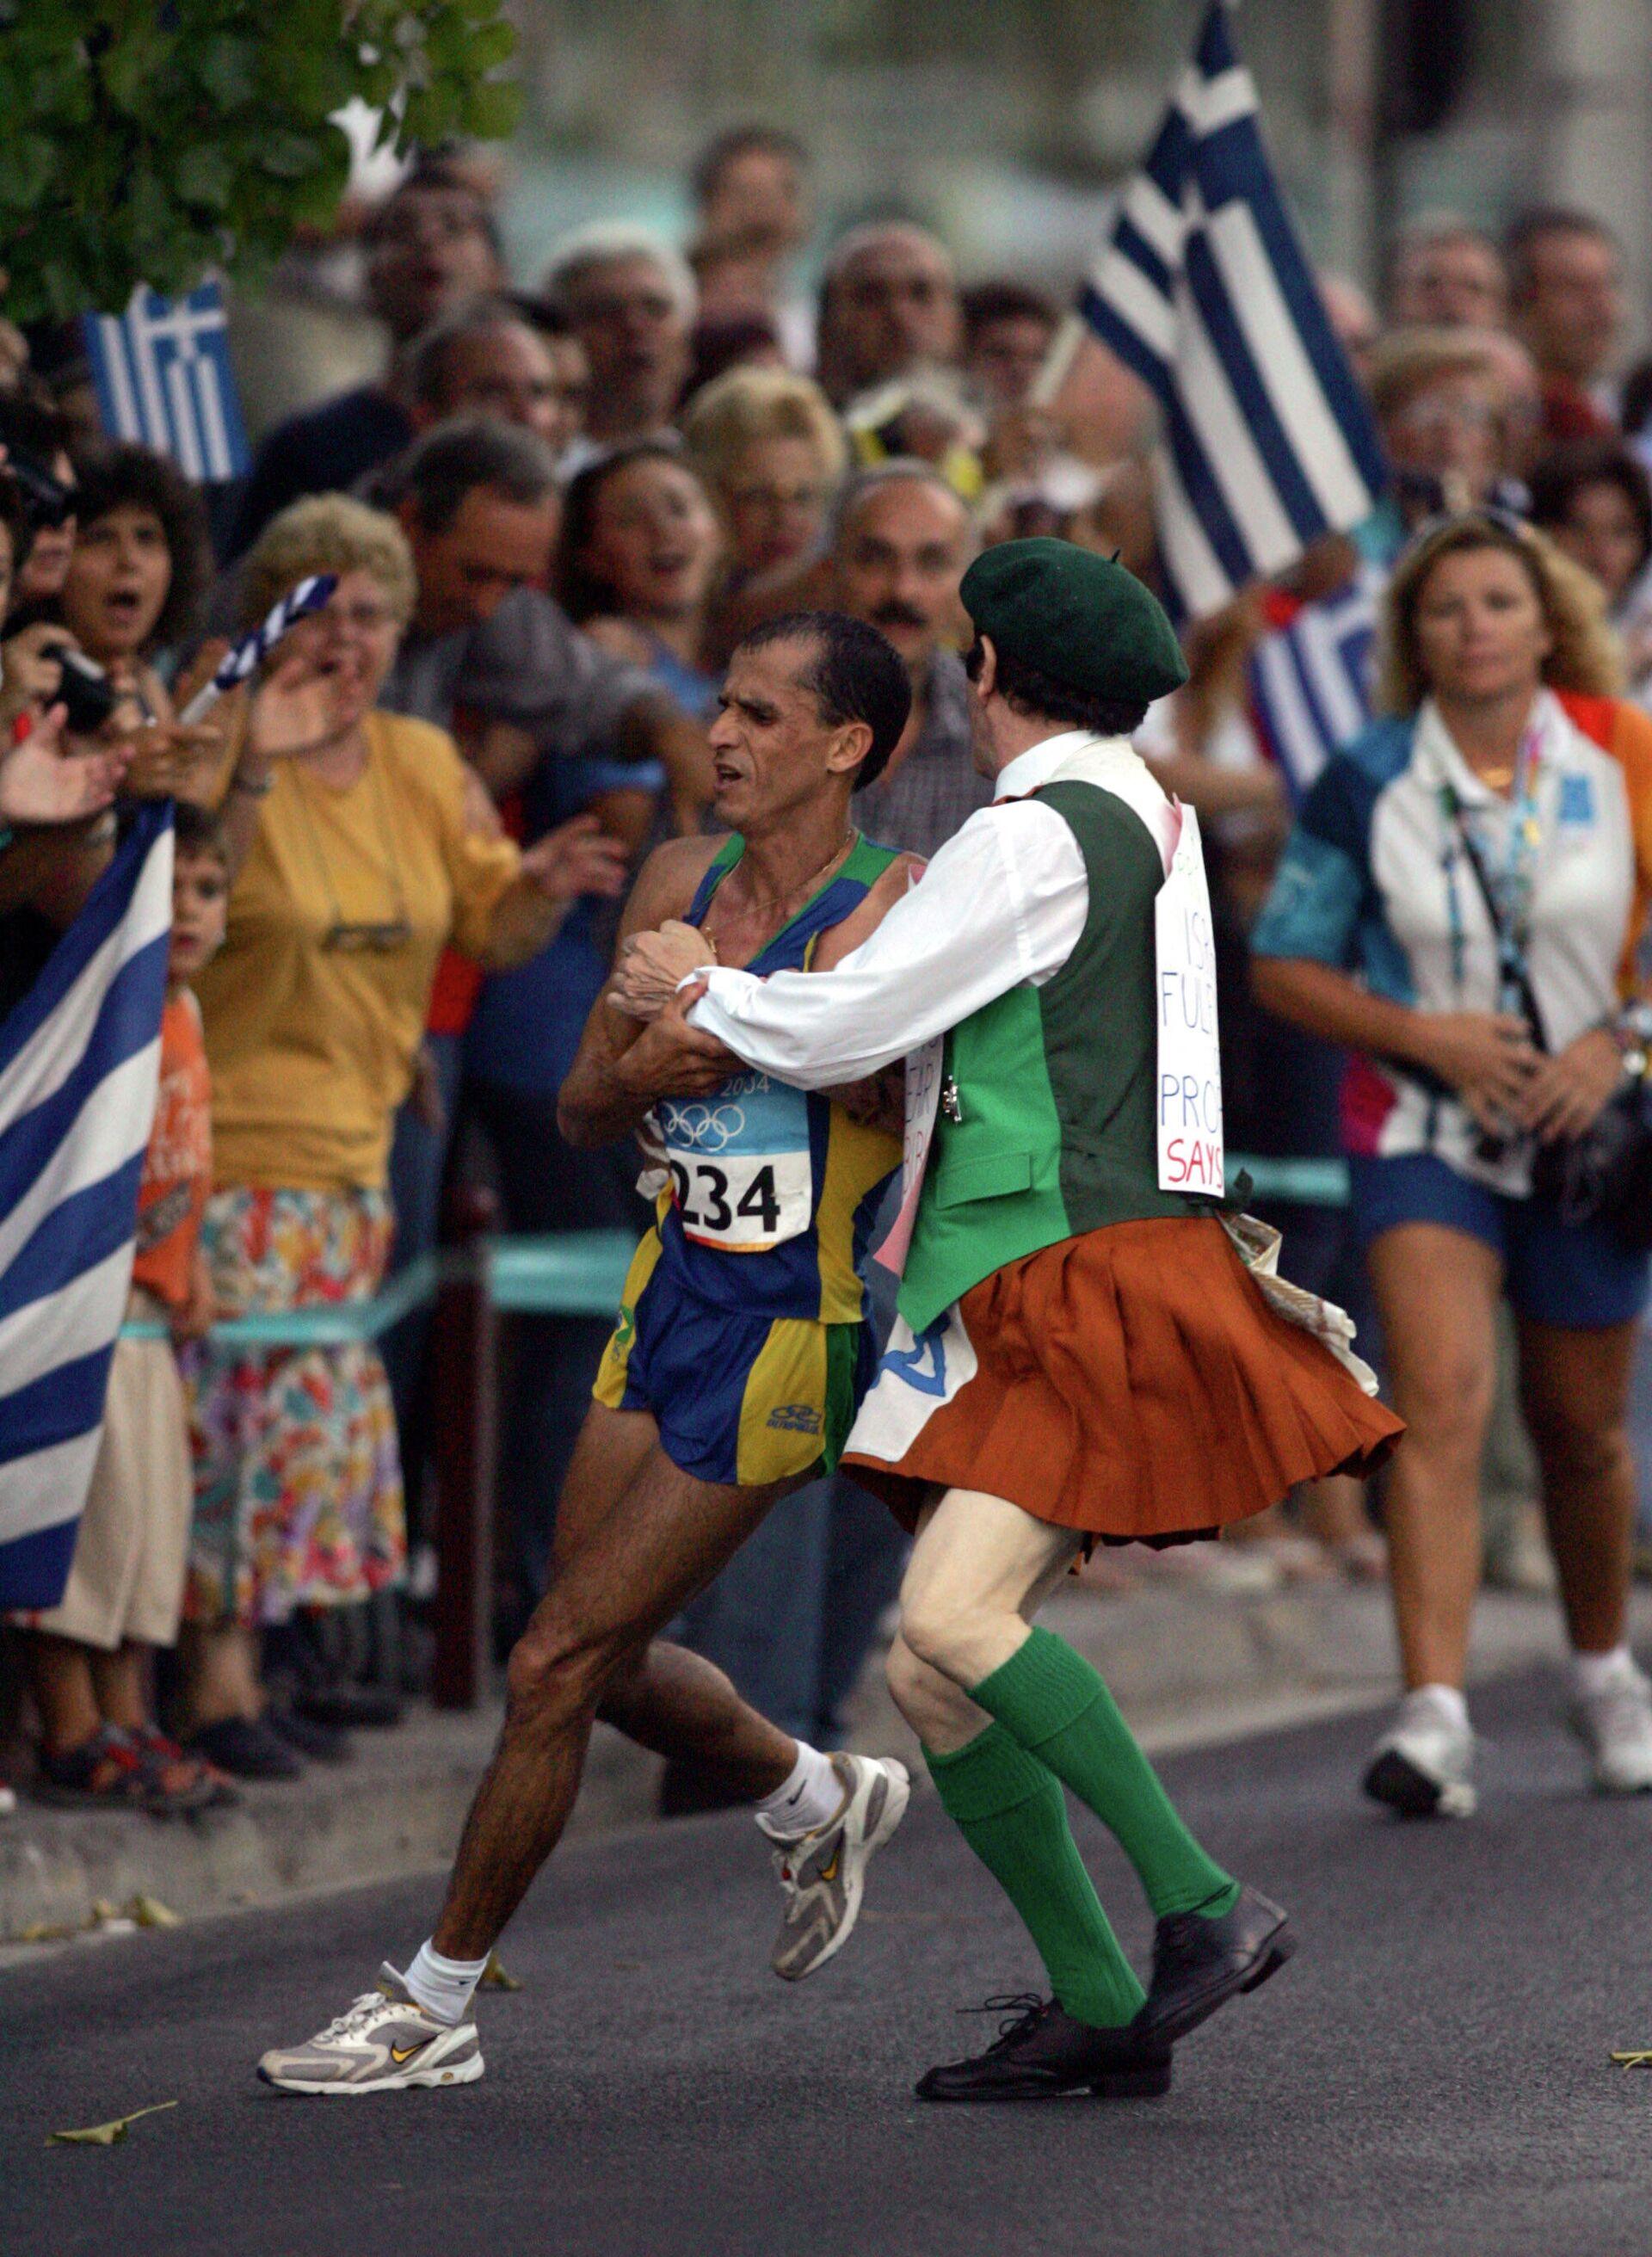 Бразилец Вандерлей ди Лима (слева) во время марафона на Олимпиаде 2004 года в Афинах - РИА Новости, 1920, 05.08.2021